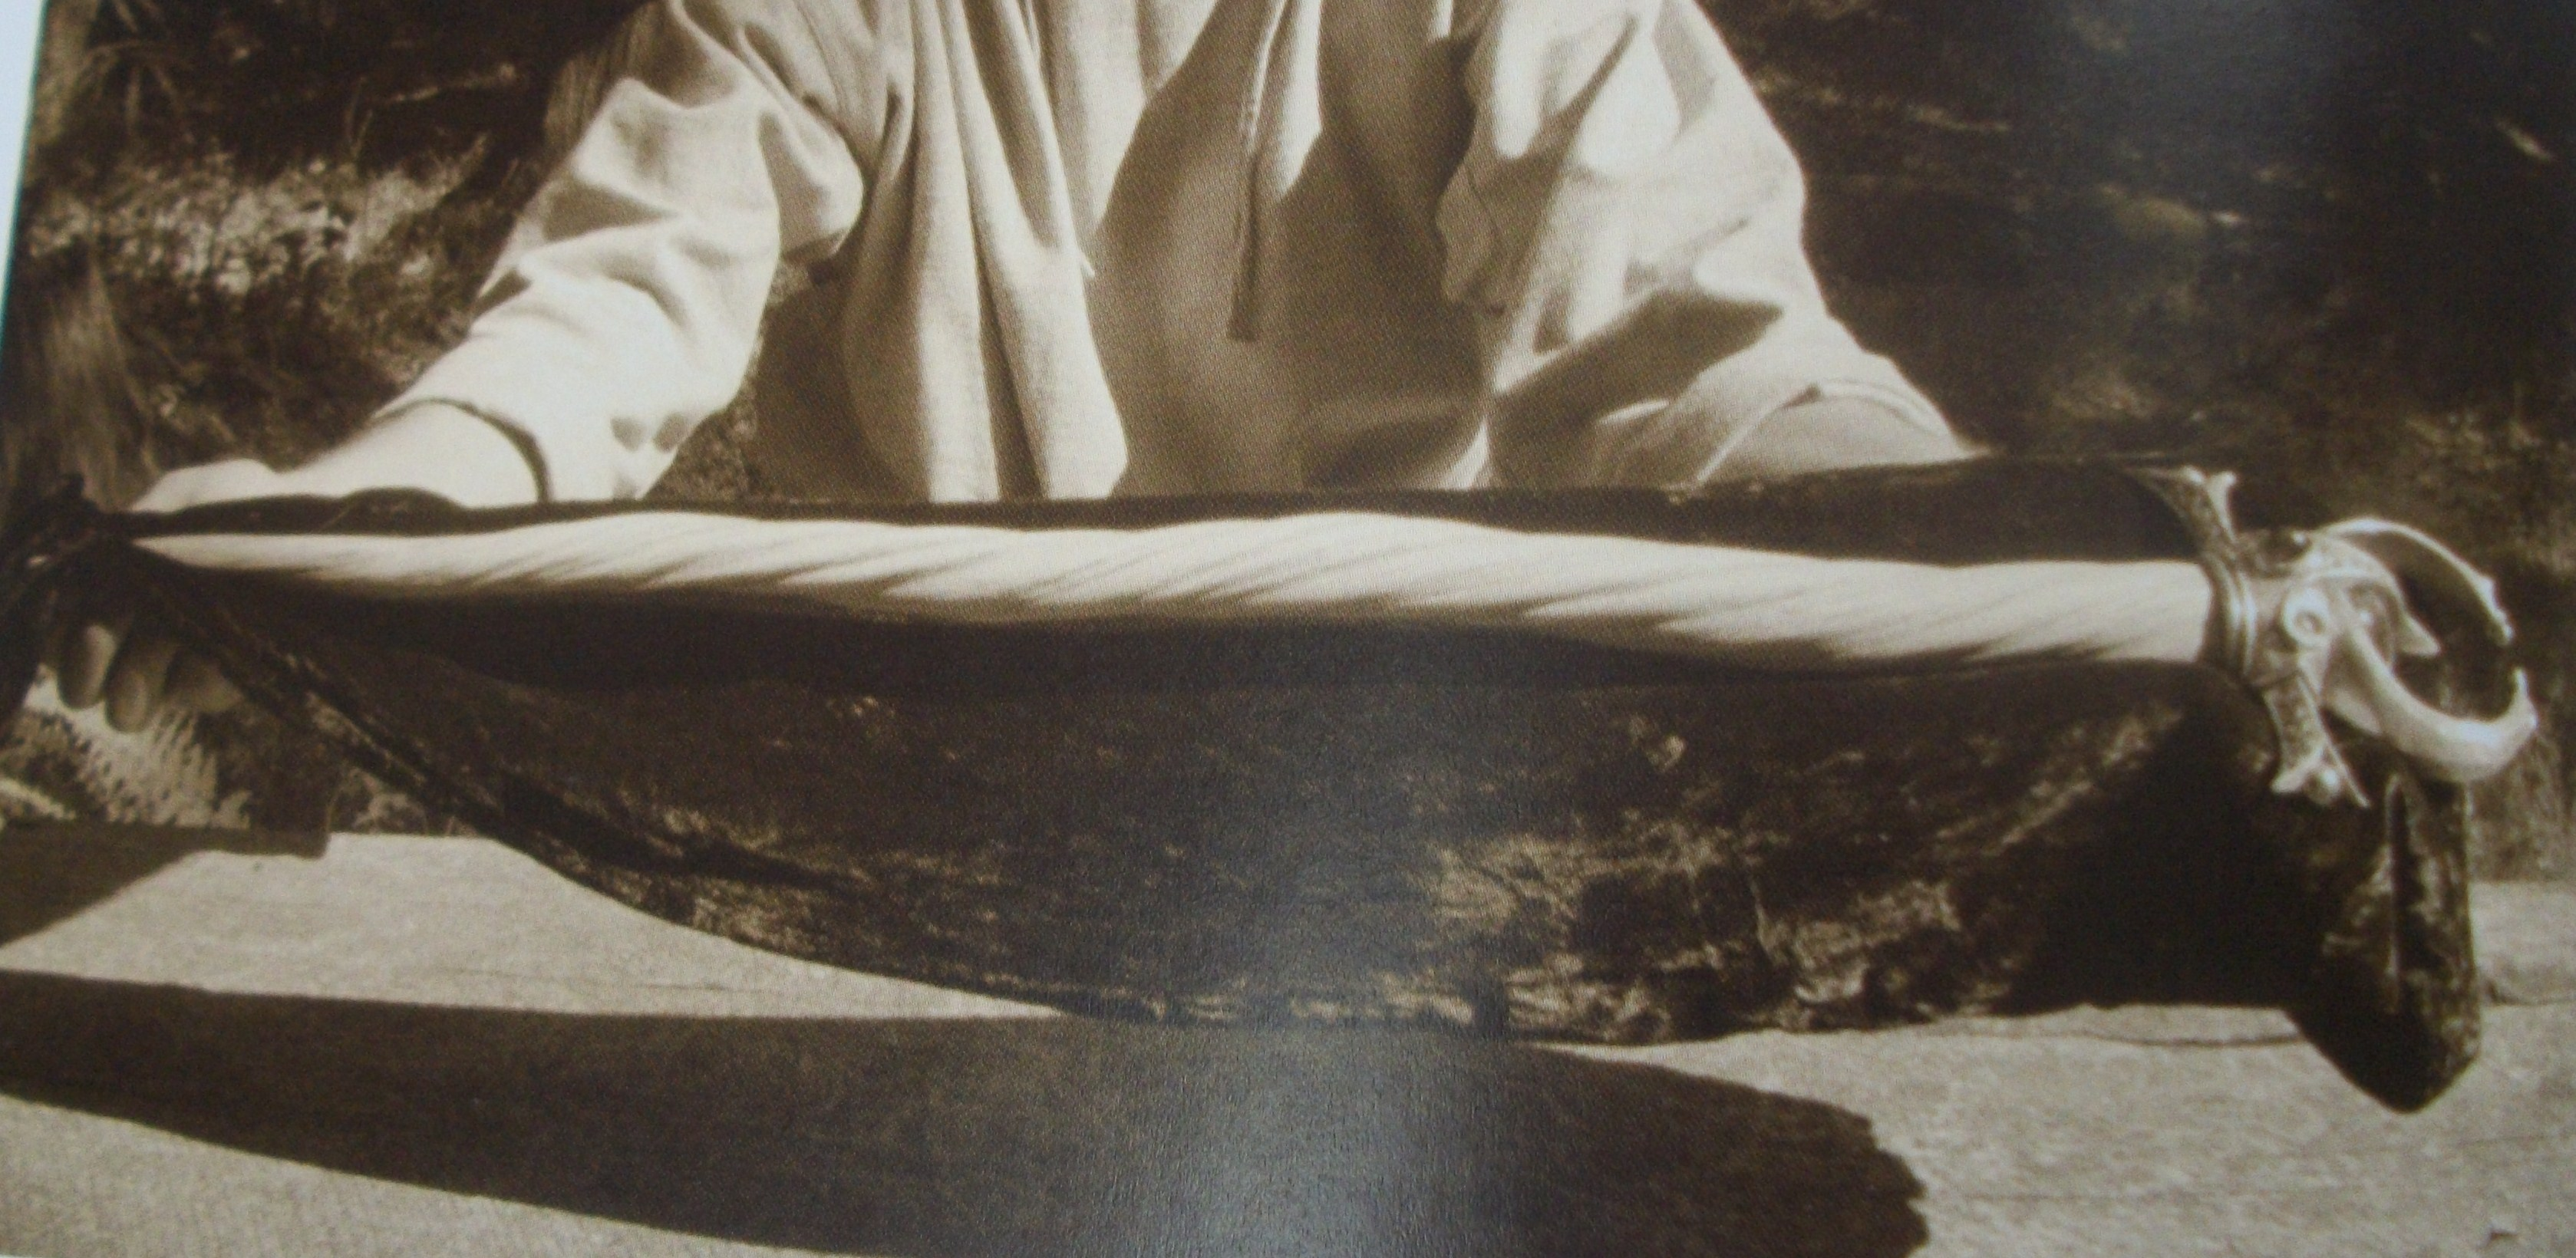 The Unicornis Manuscripts Silver Horn